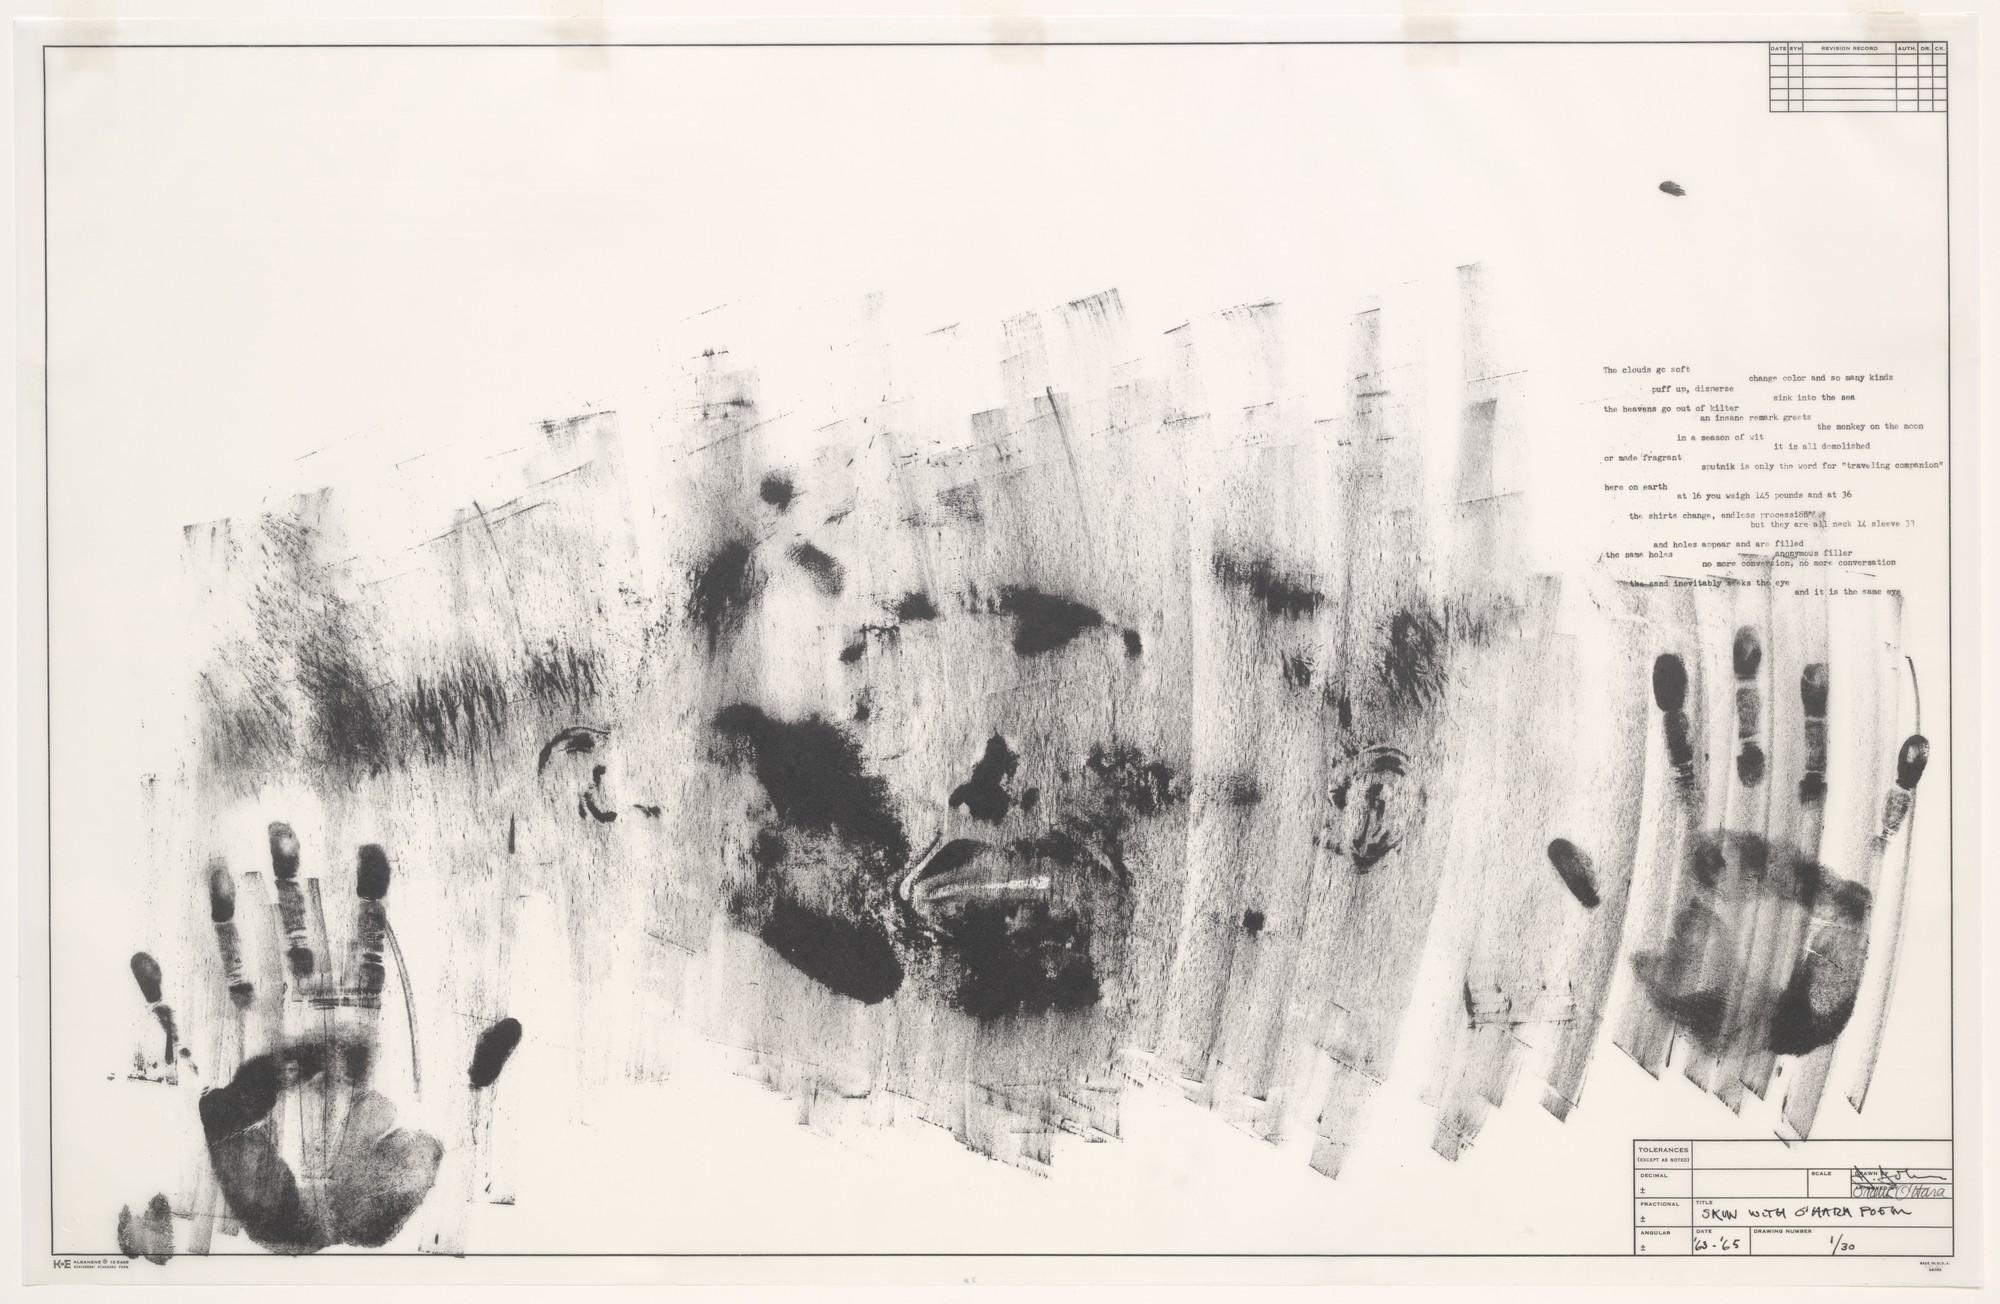 Jasper Johns, Skin with O'Hara Poem. 1964/65